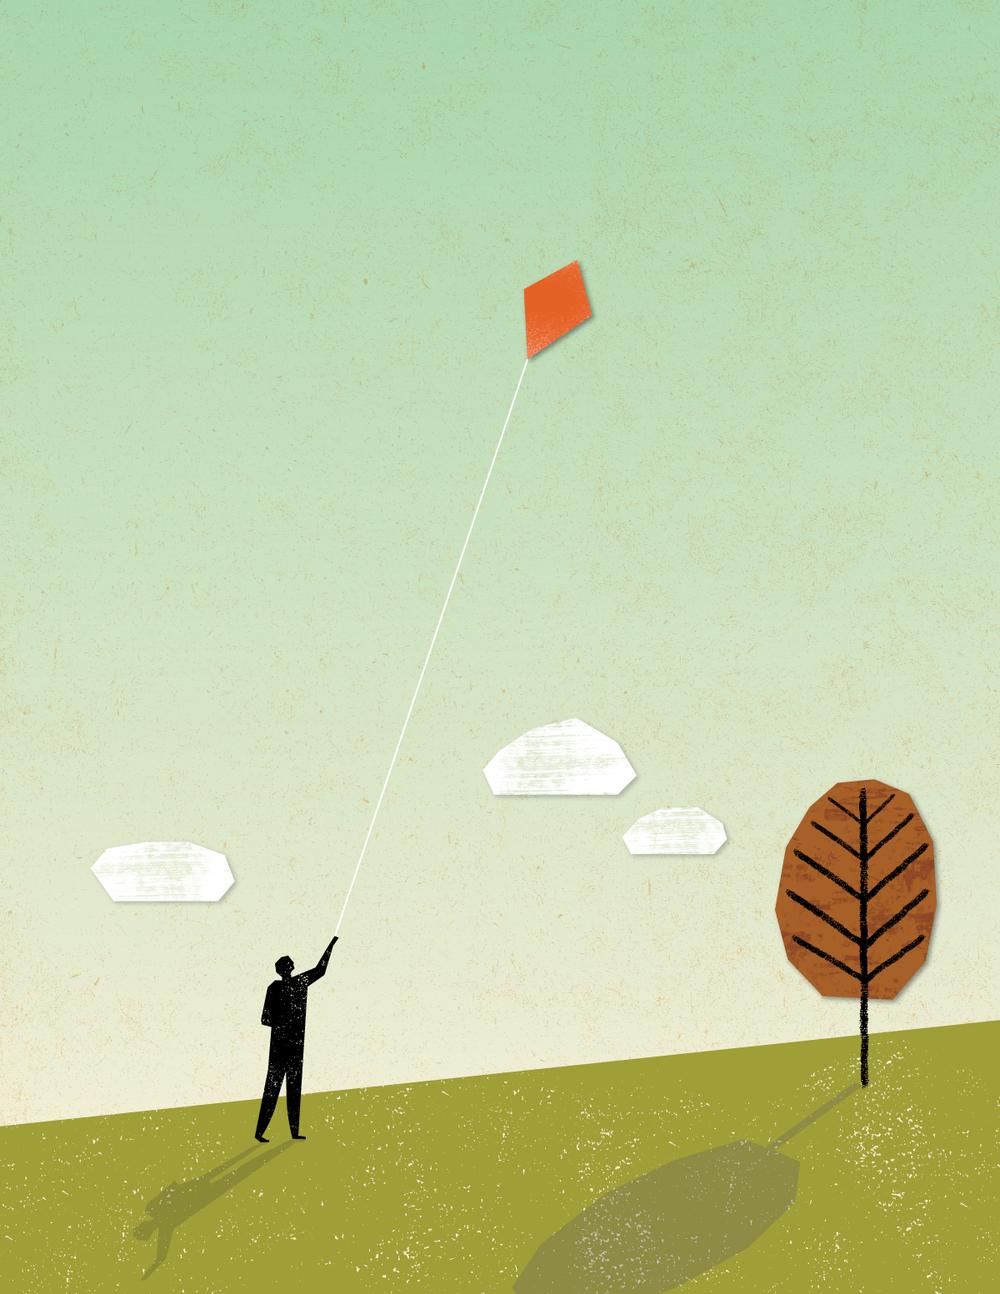 Kite flying by Nate Padavick